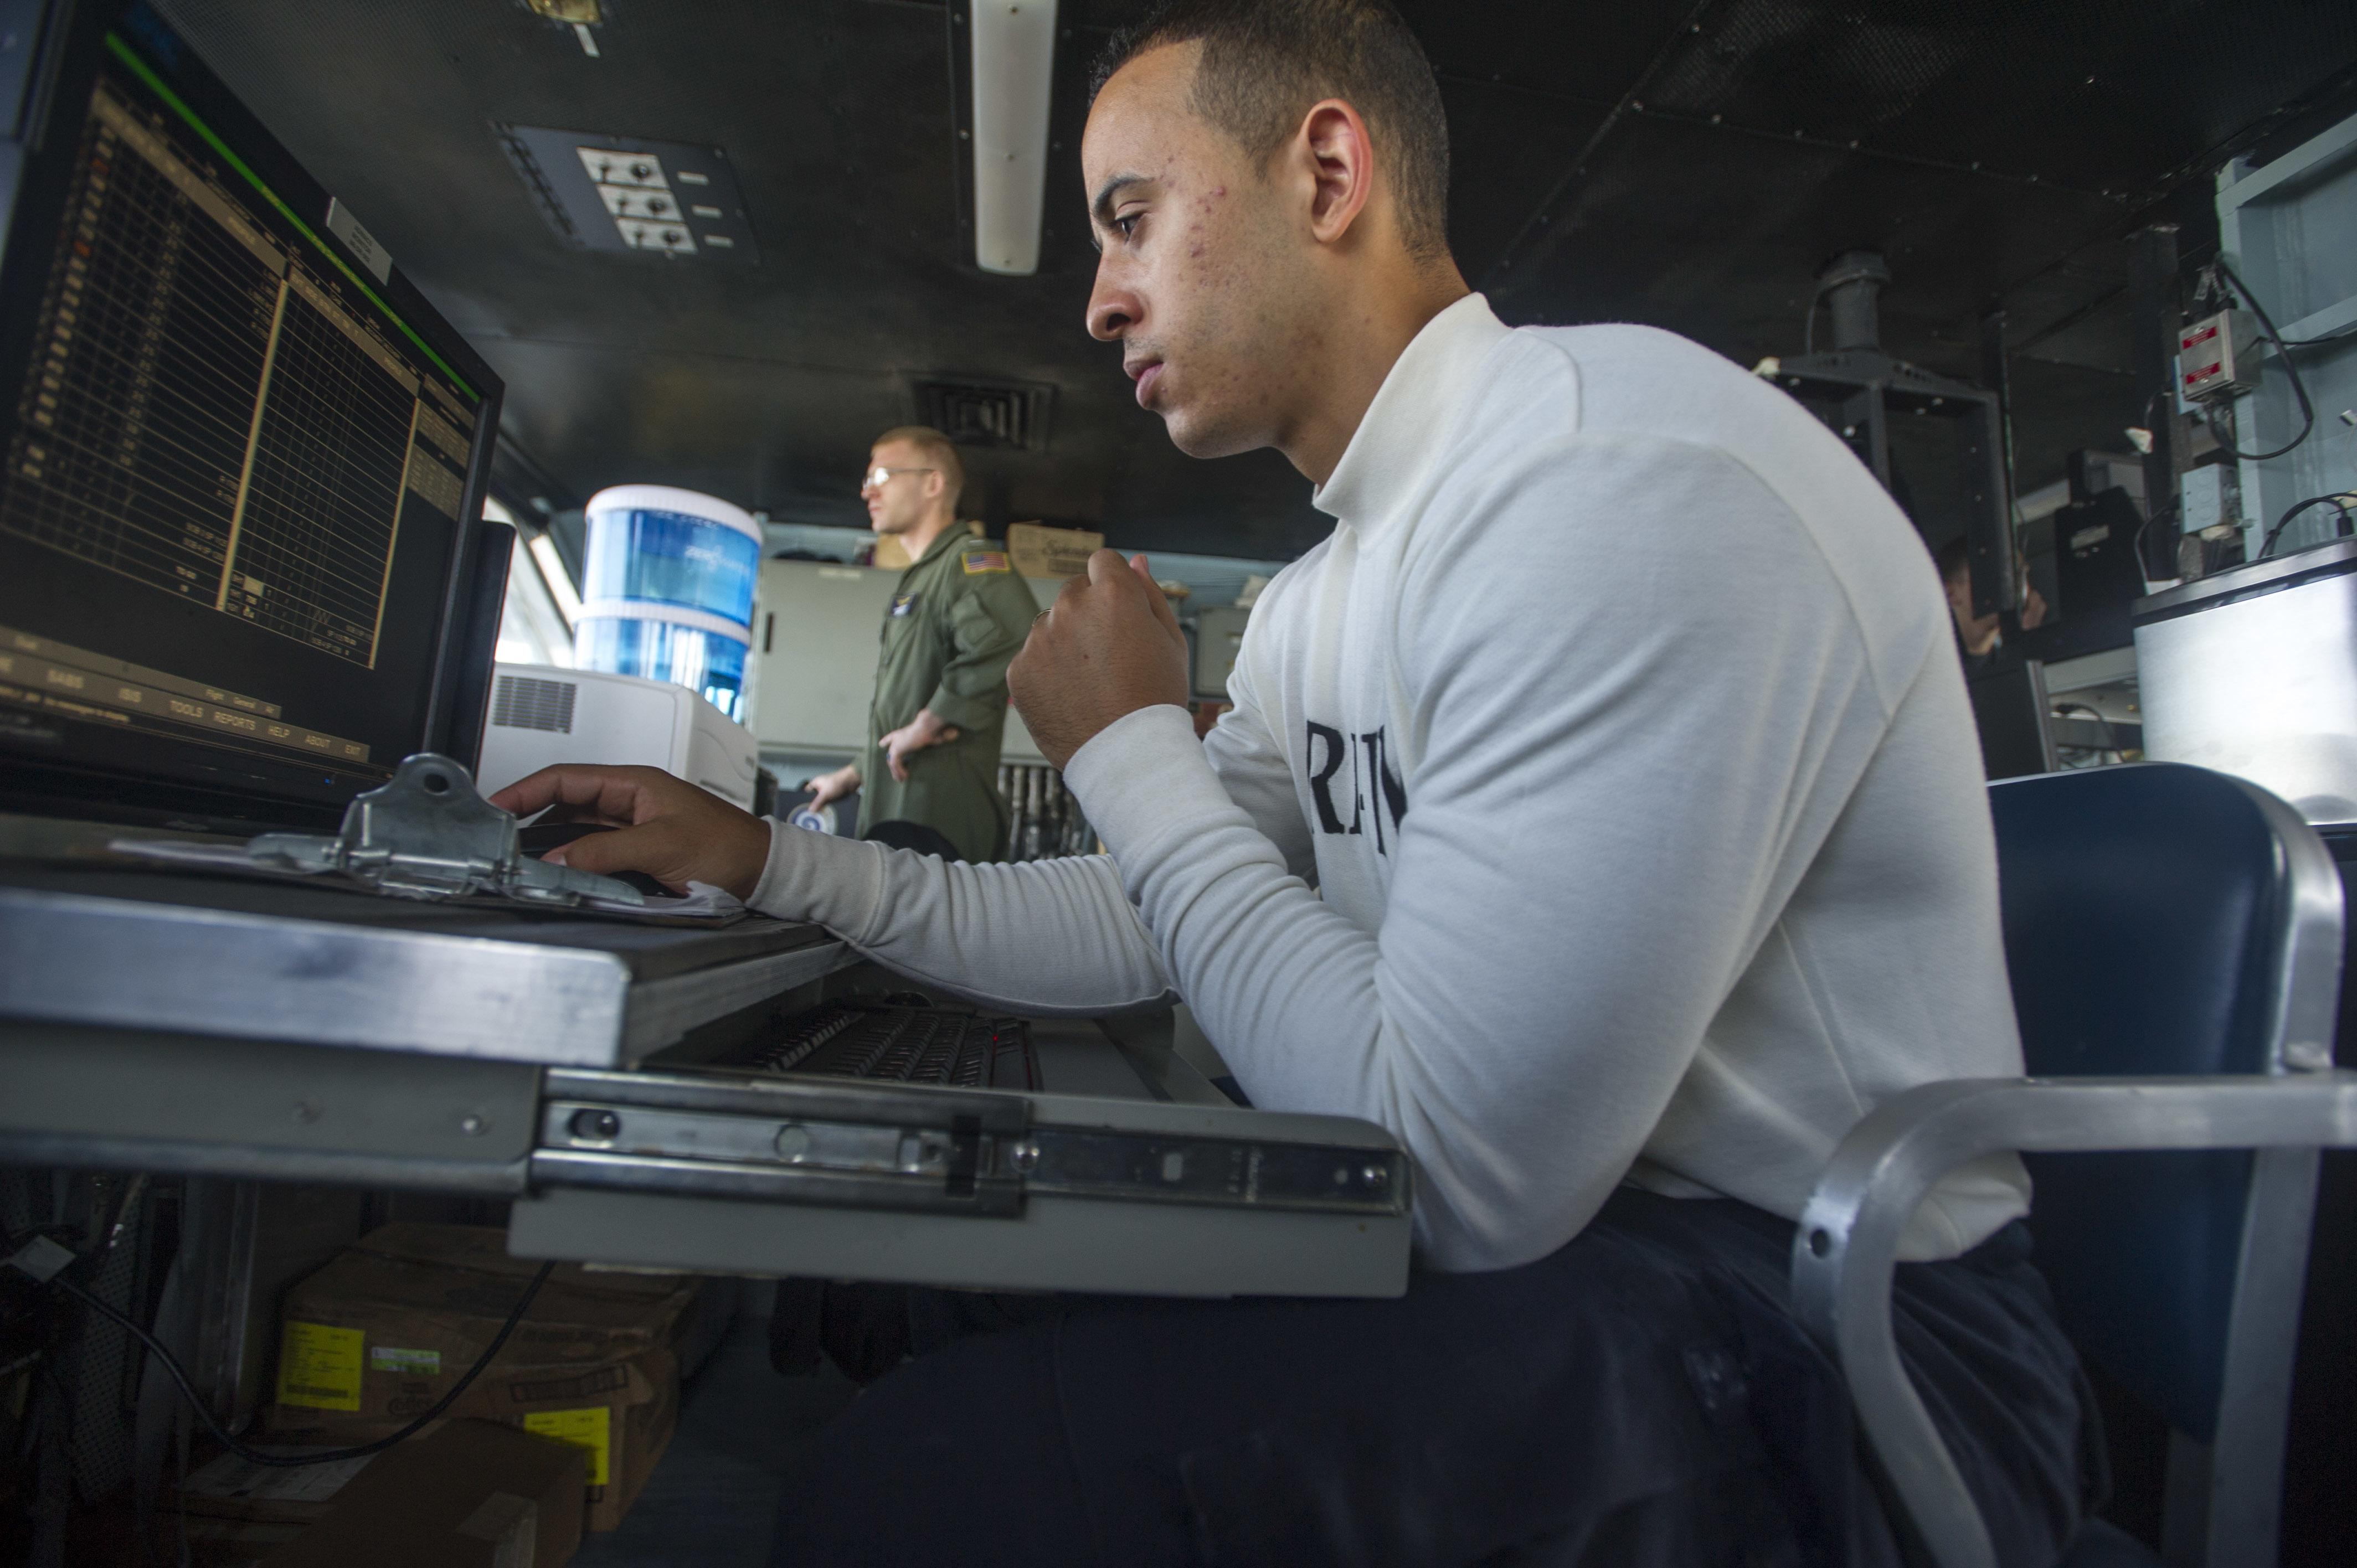 Seaman inputs flight information